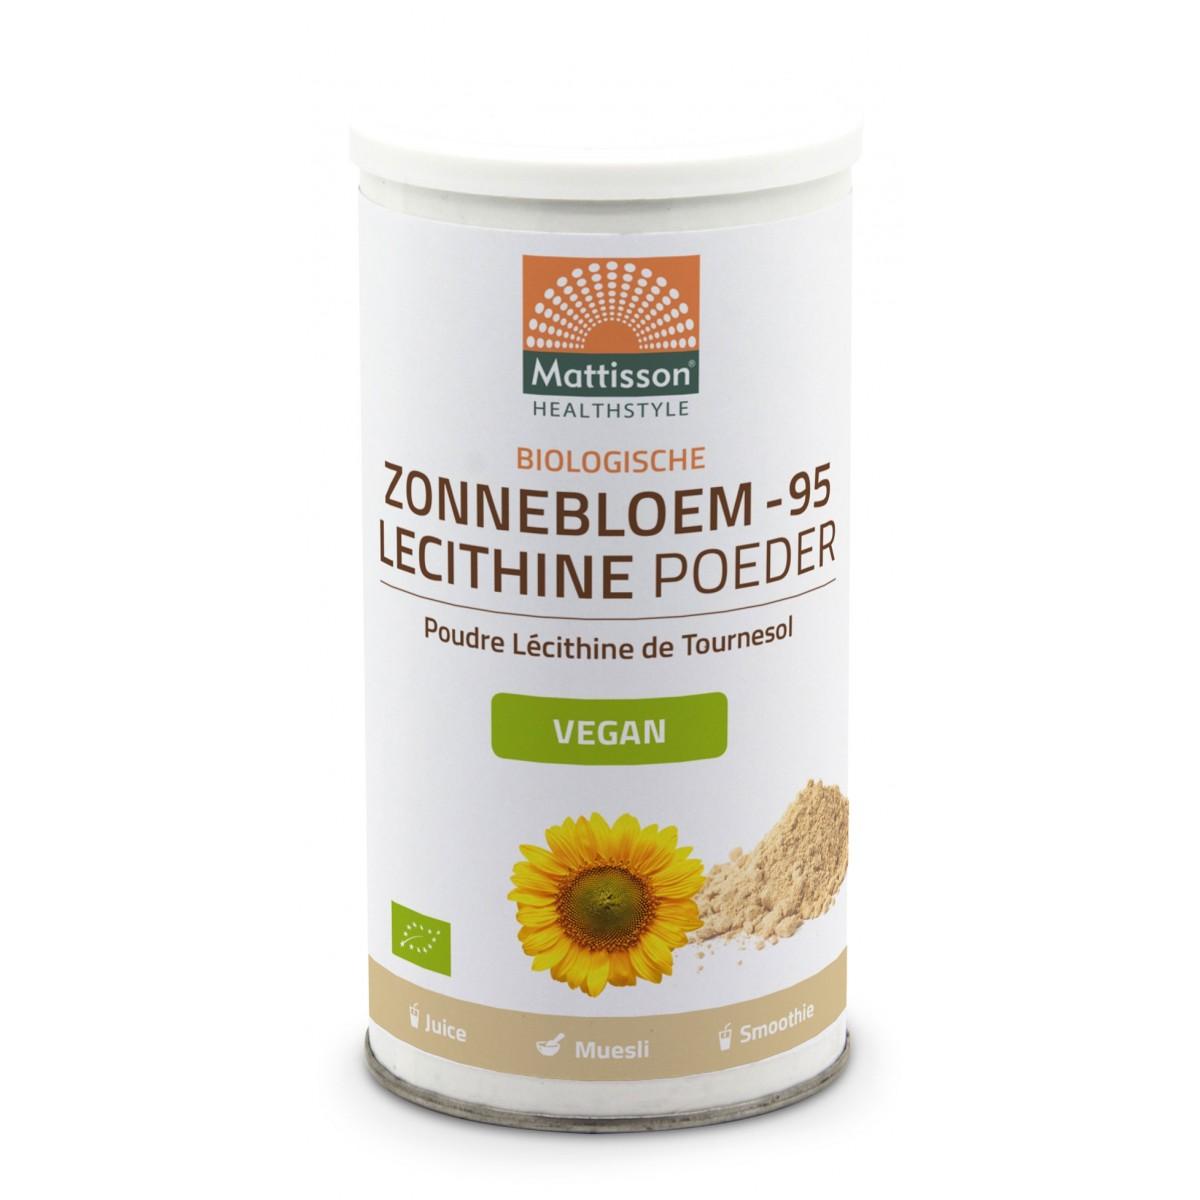 Zonnebloem -95 Lecithine Poeder